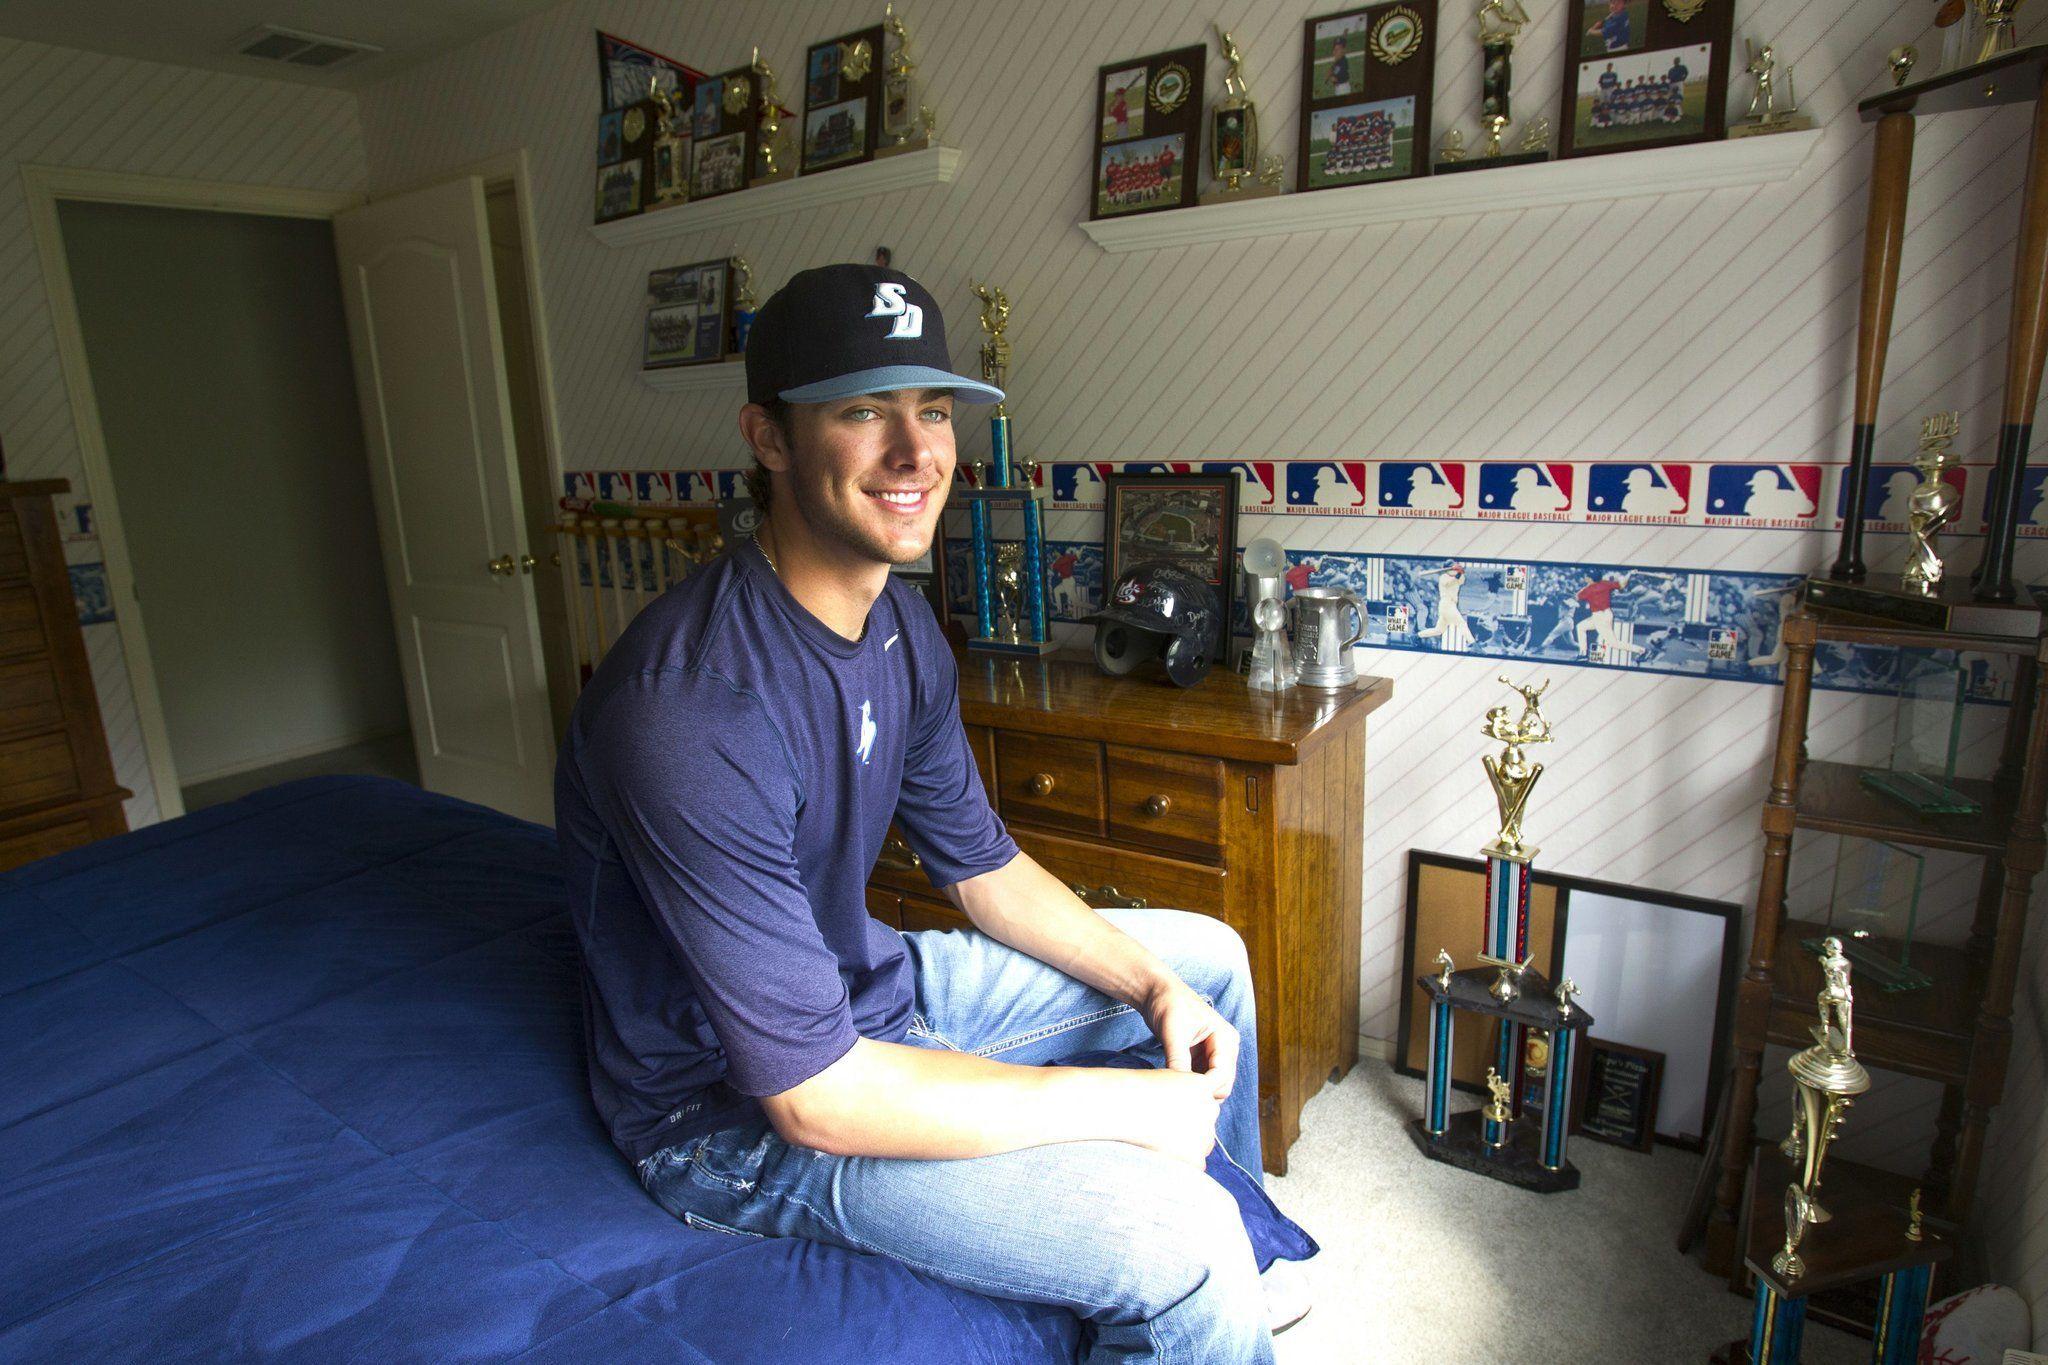 Pin by emily loves baseball on kris bryant ️ Kris bryant